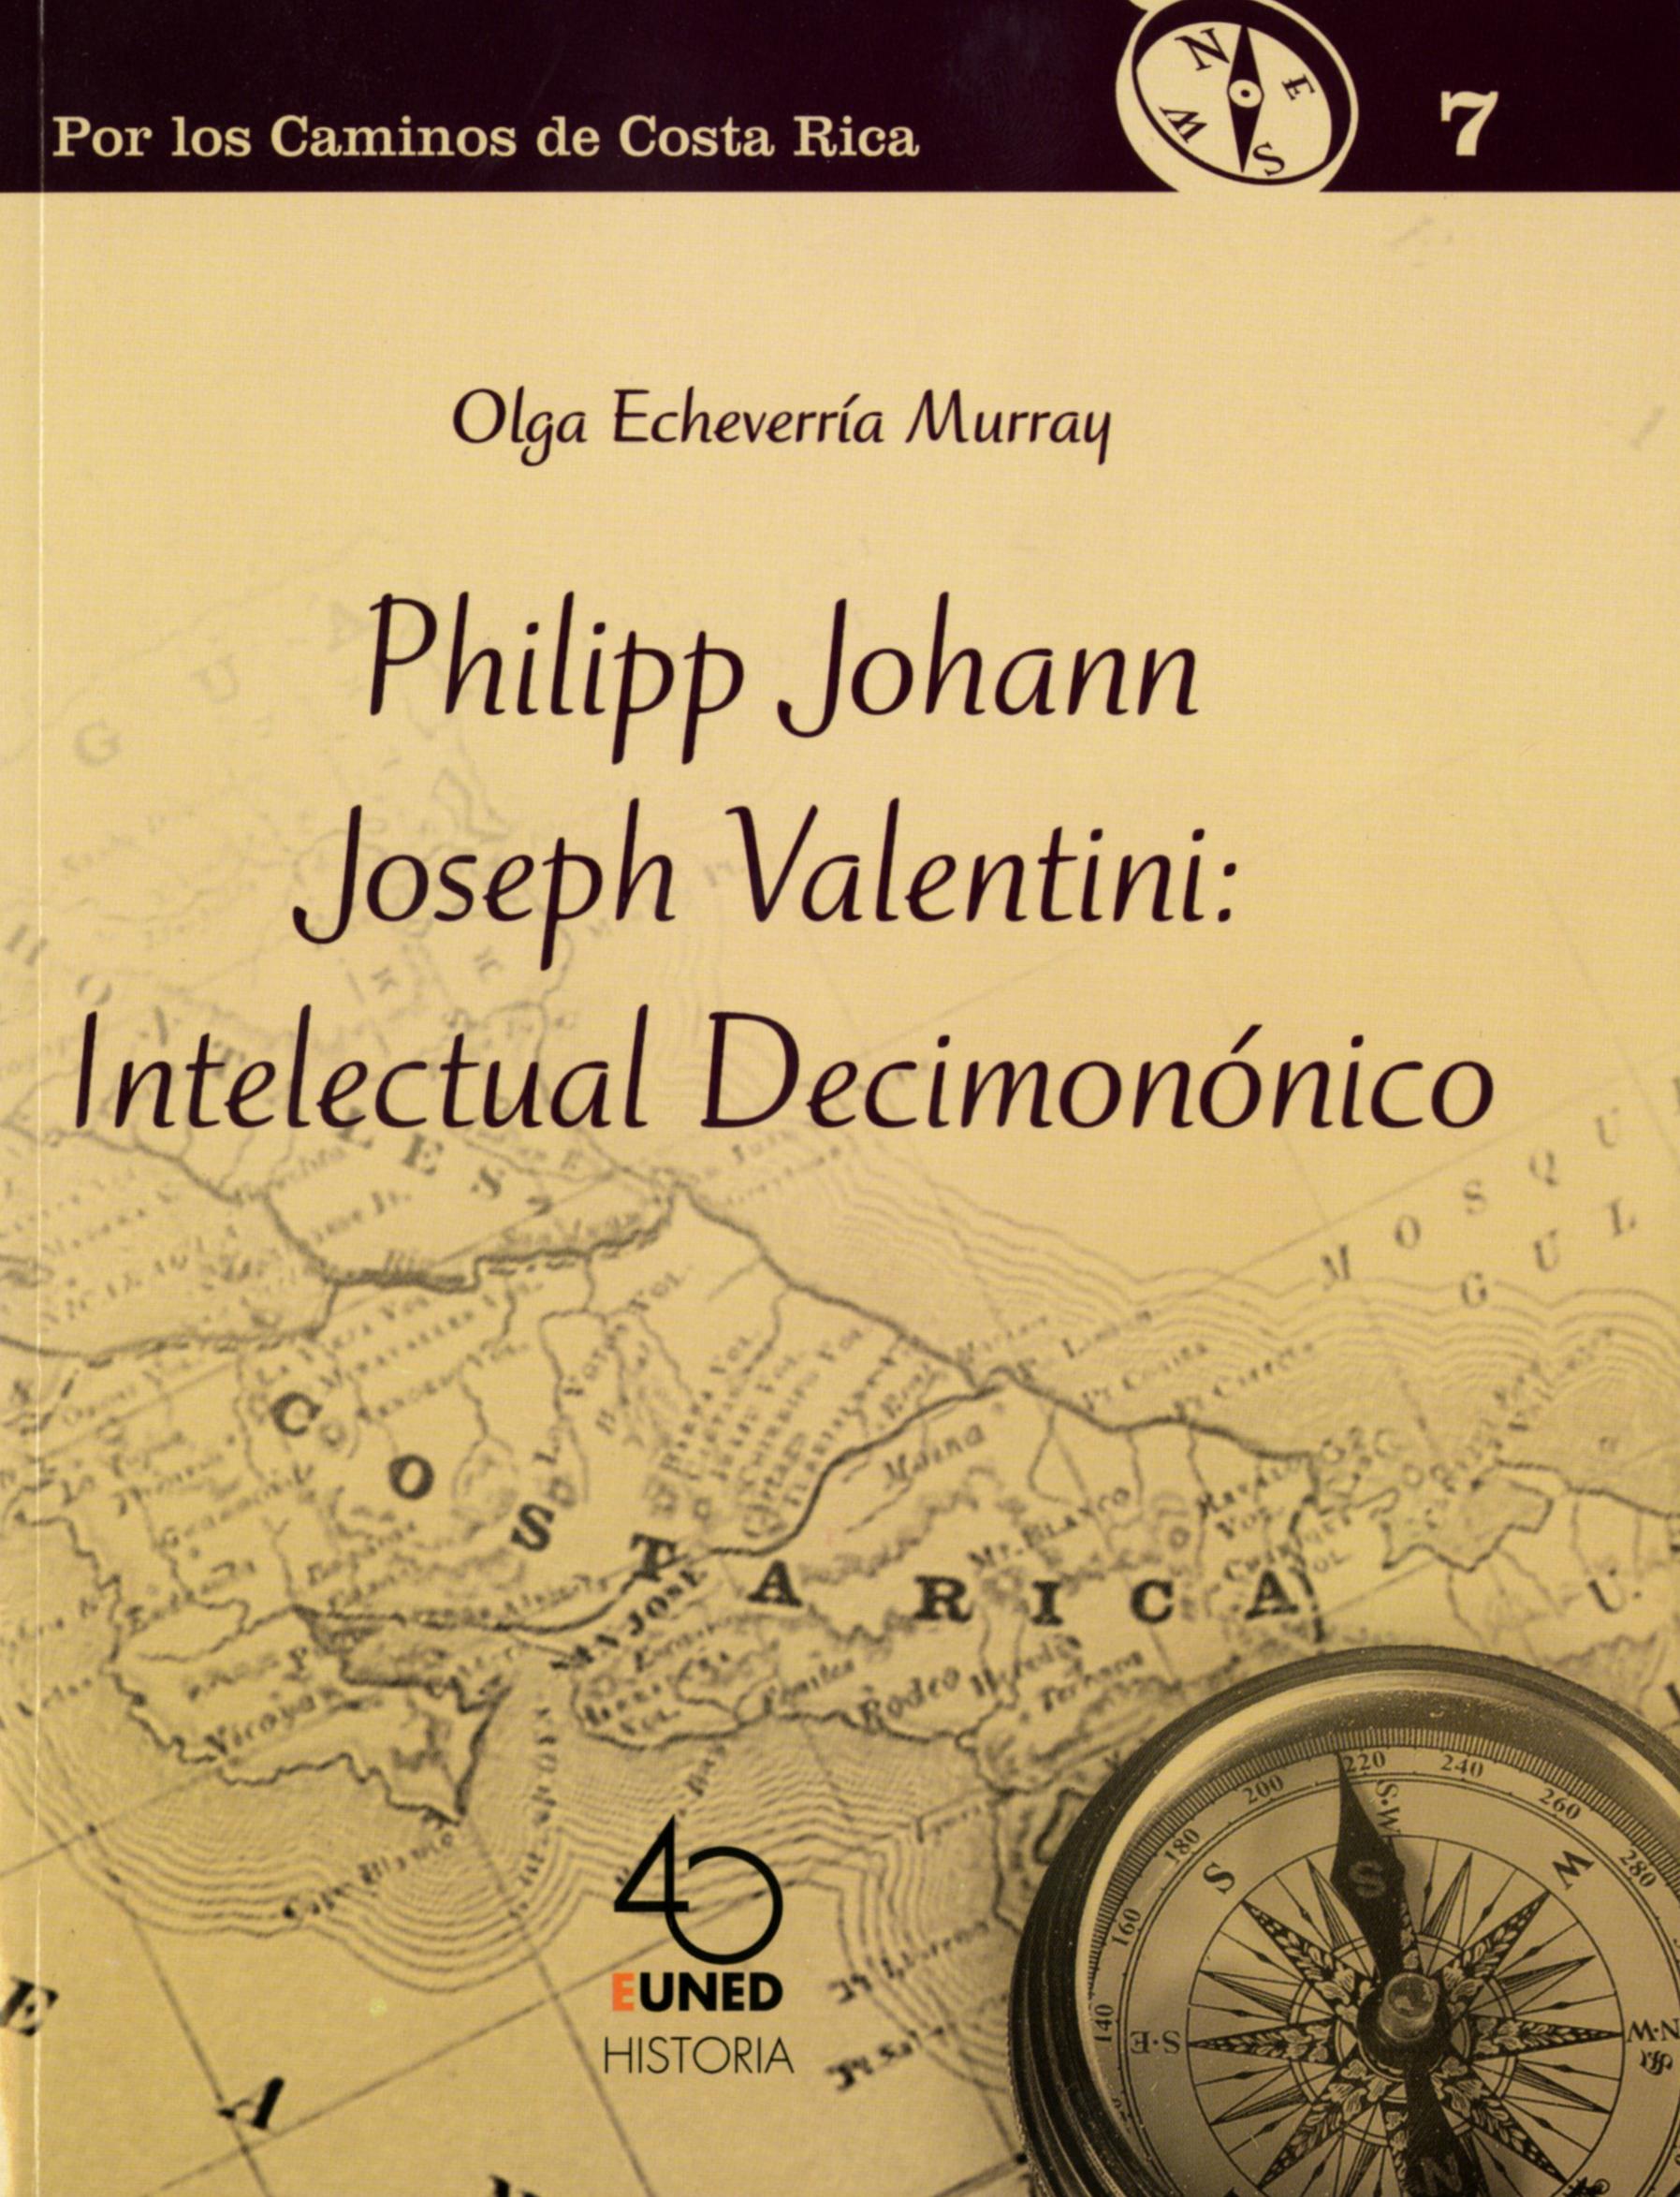 Philipp Johann Joseph Valentini: Intelectual Decimonónico